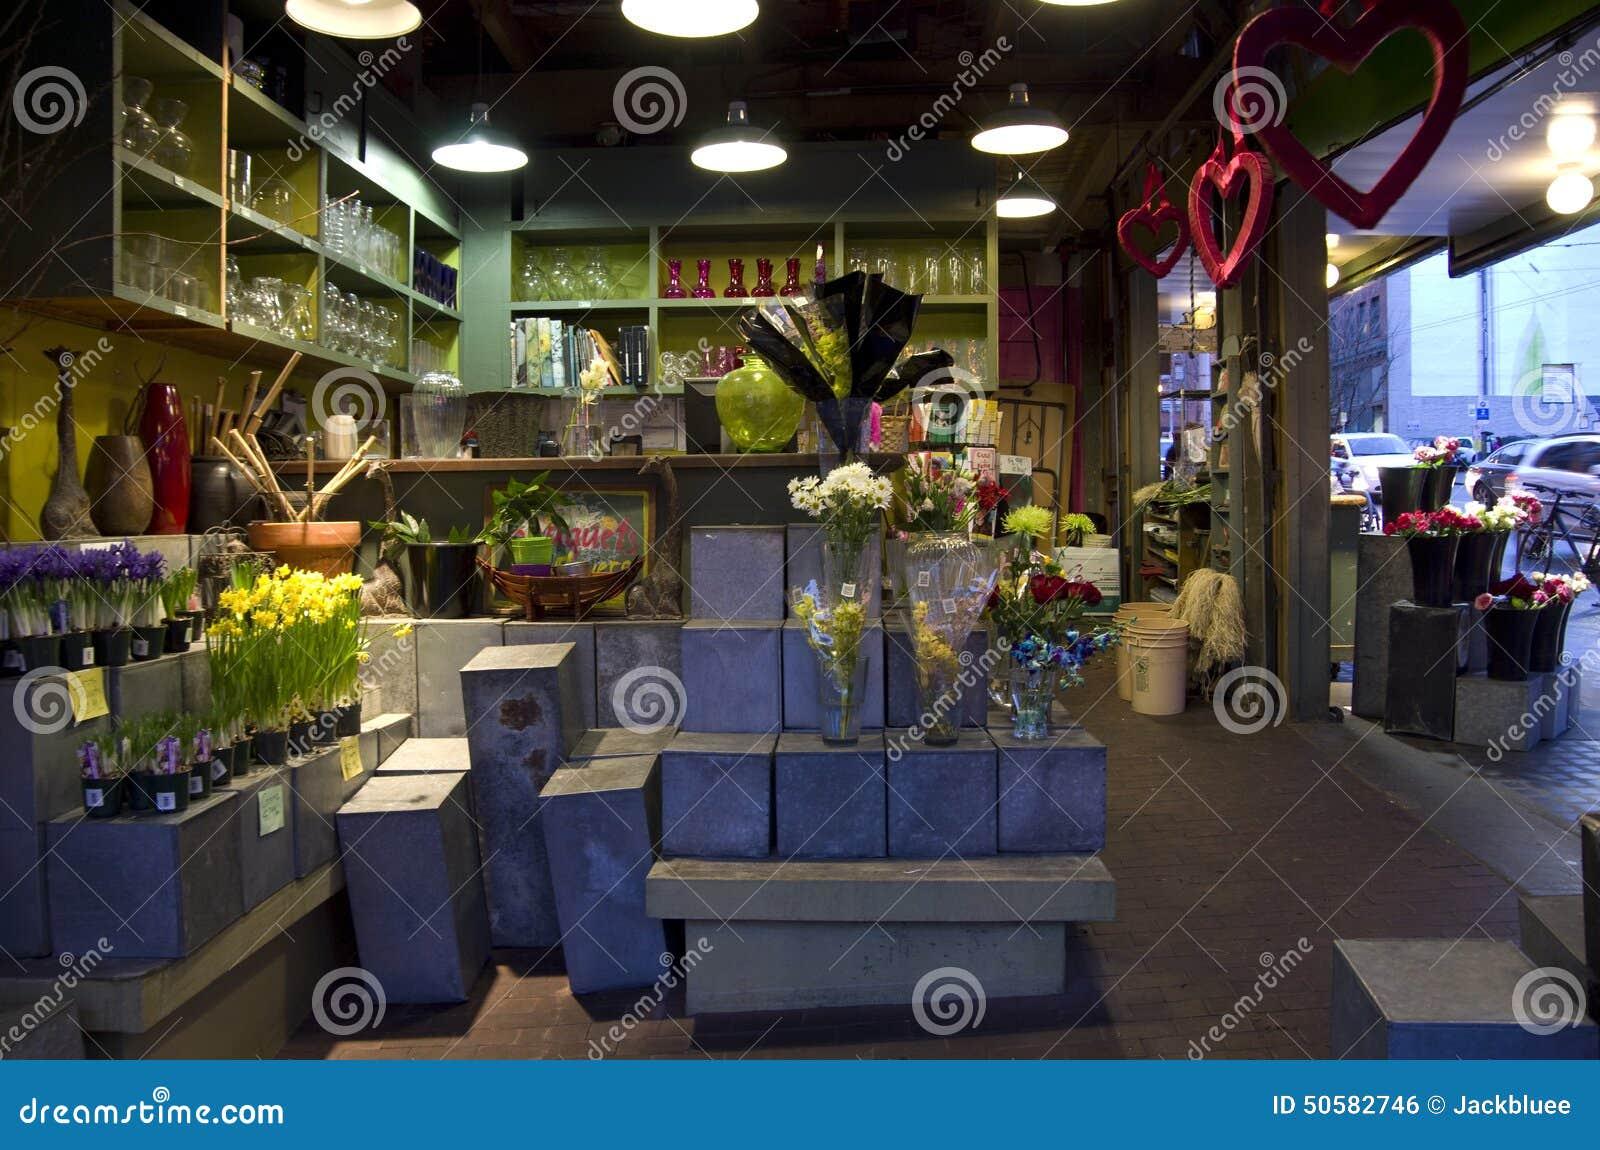 Flower shop interior lighting editorial photo image for Designs east florist interior